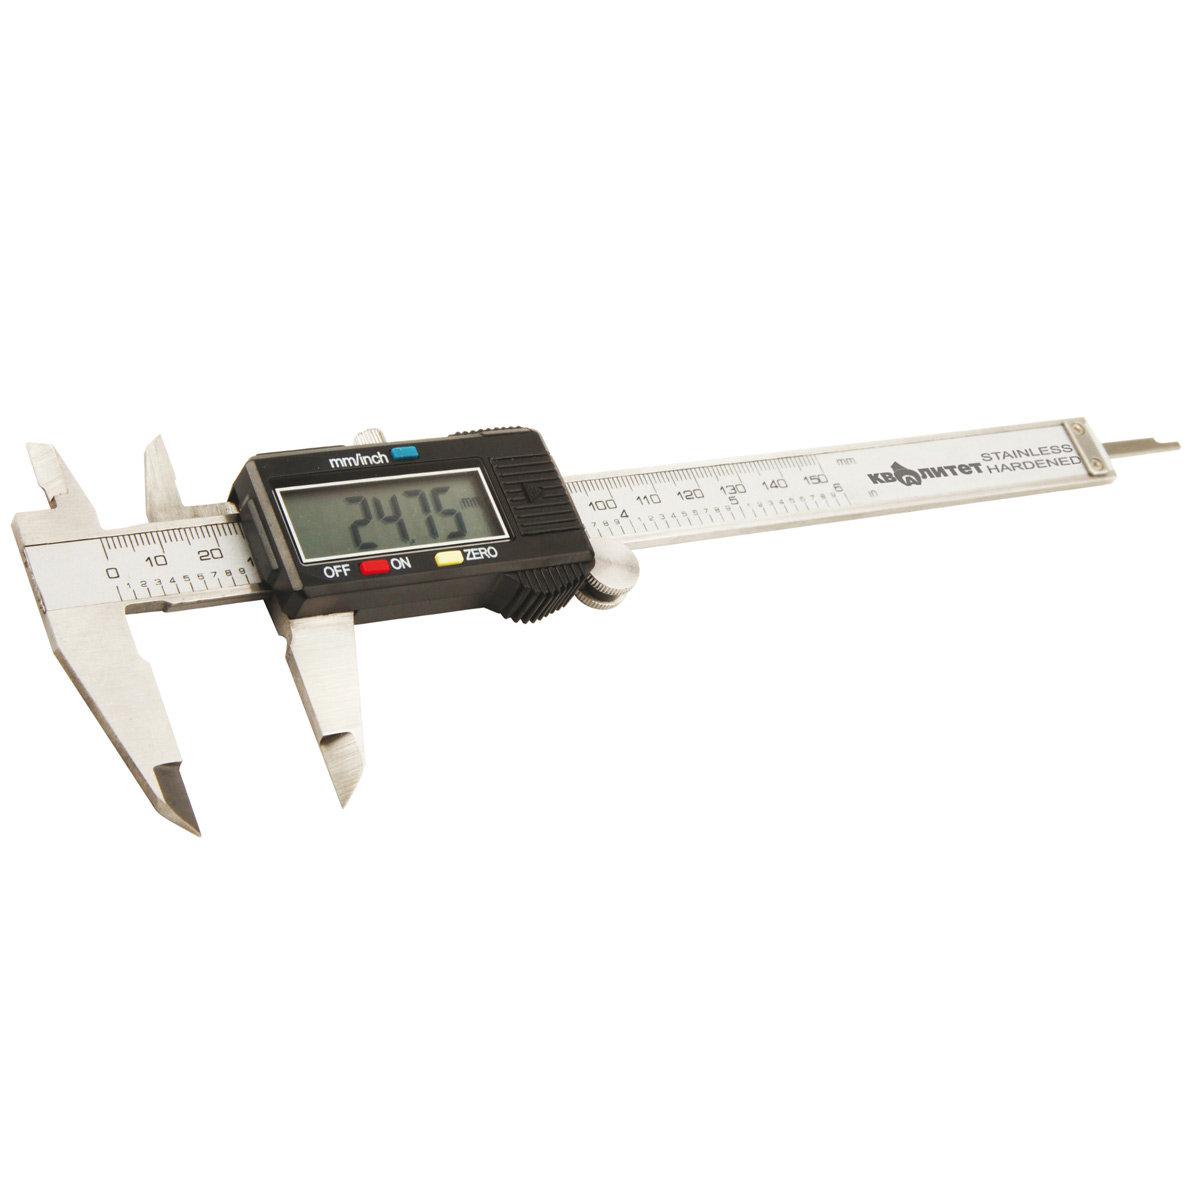 Штангенциркуль Квалитет электронный 150 мм ШЦ-150Э